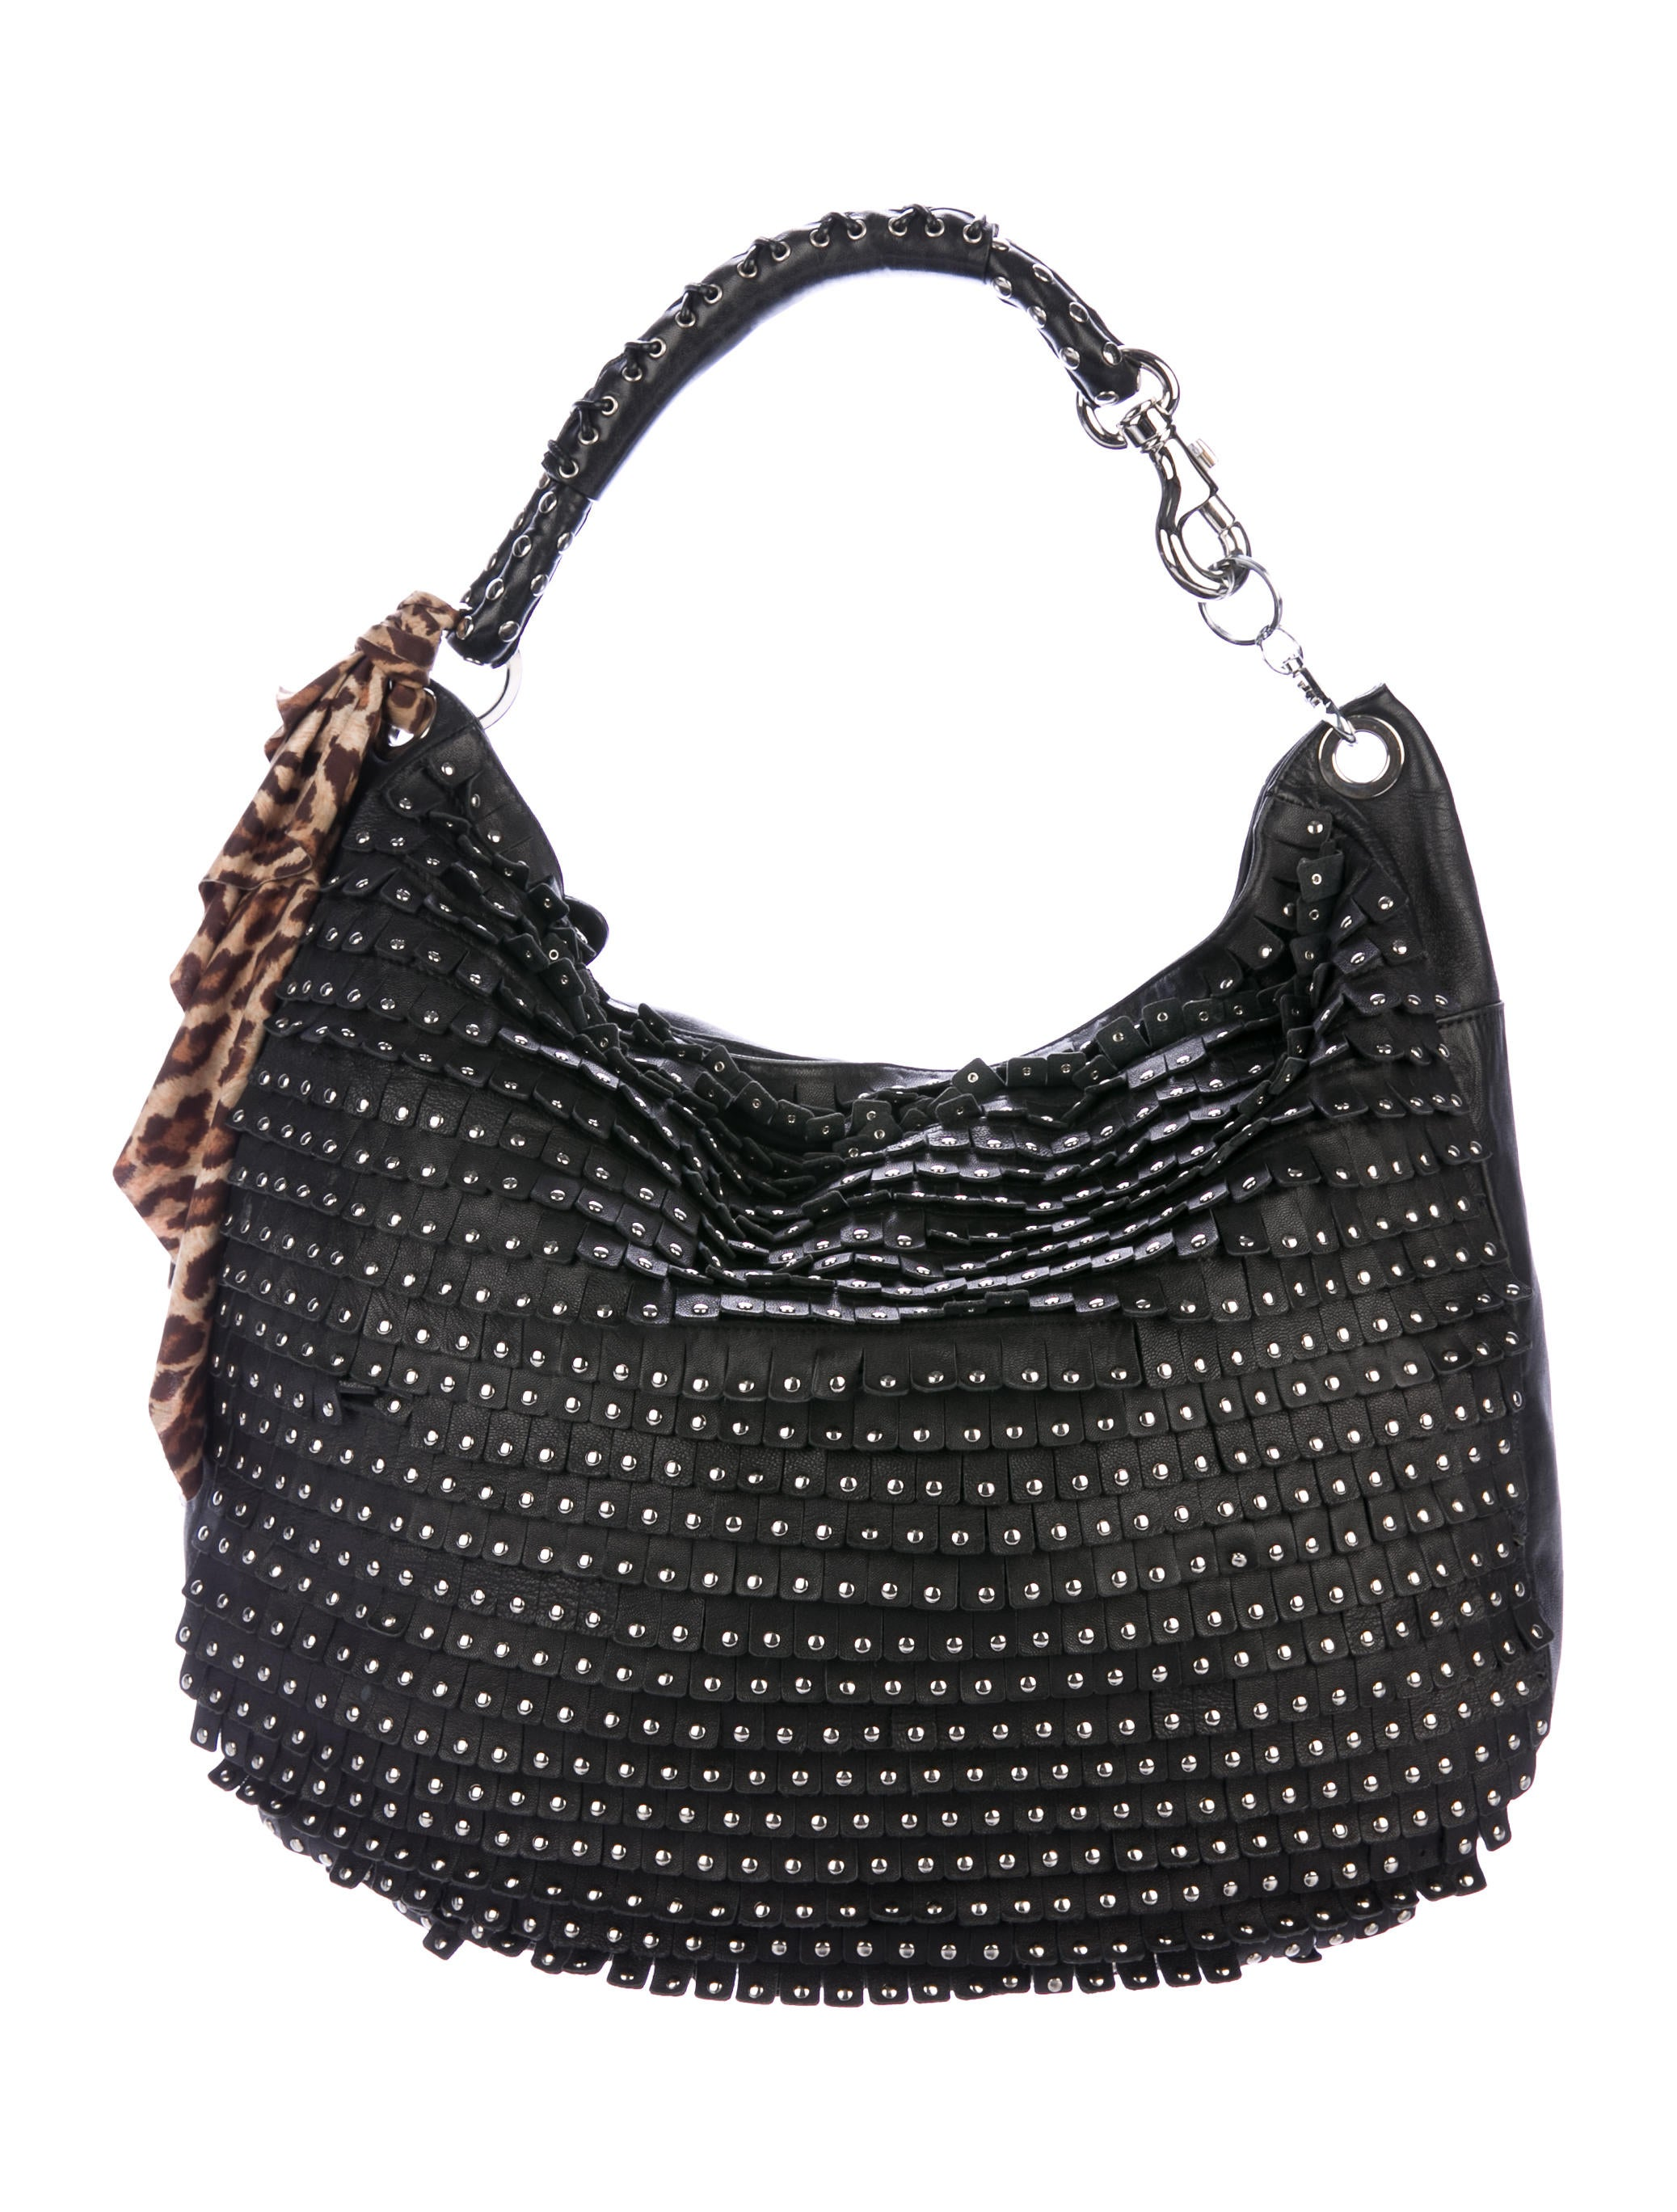 f9a4dcbdd5 Jimmy Choo Sky Studded Fringe Hobo - Handbags - JIM83351 | The RealReal